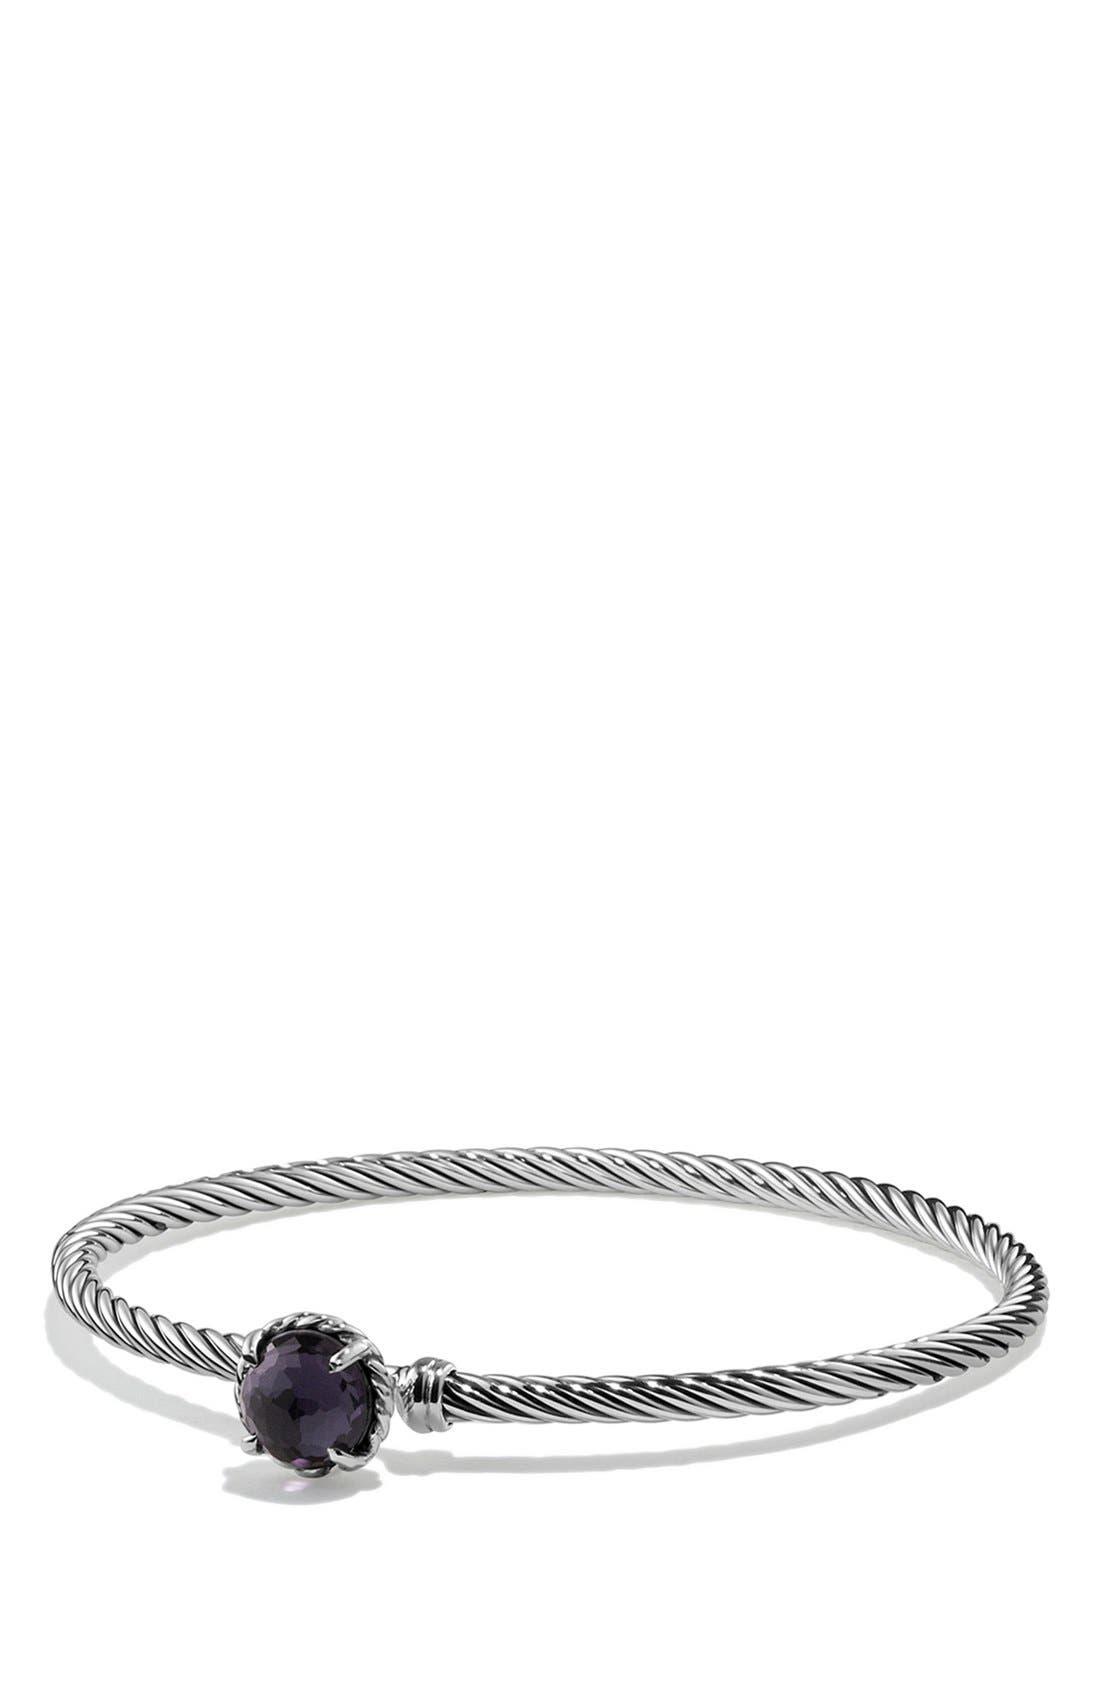 Alternate Image 2  - David Yurman 'Color Classics' Bangle Bracelet